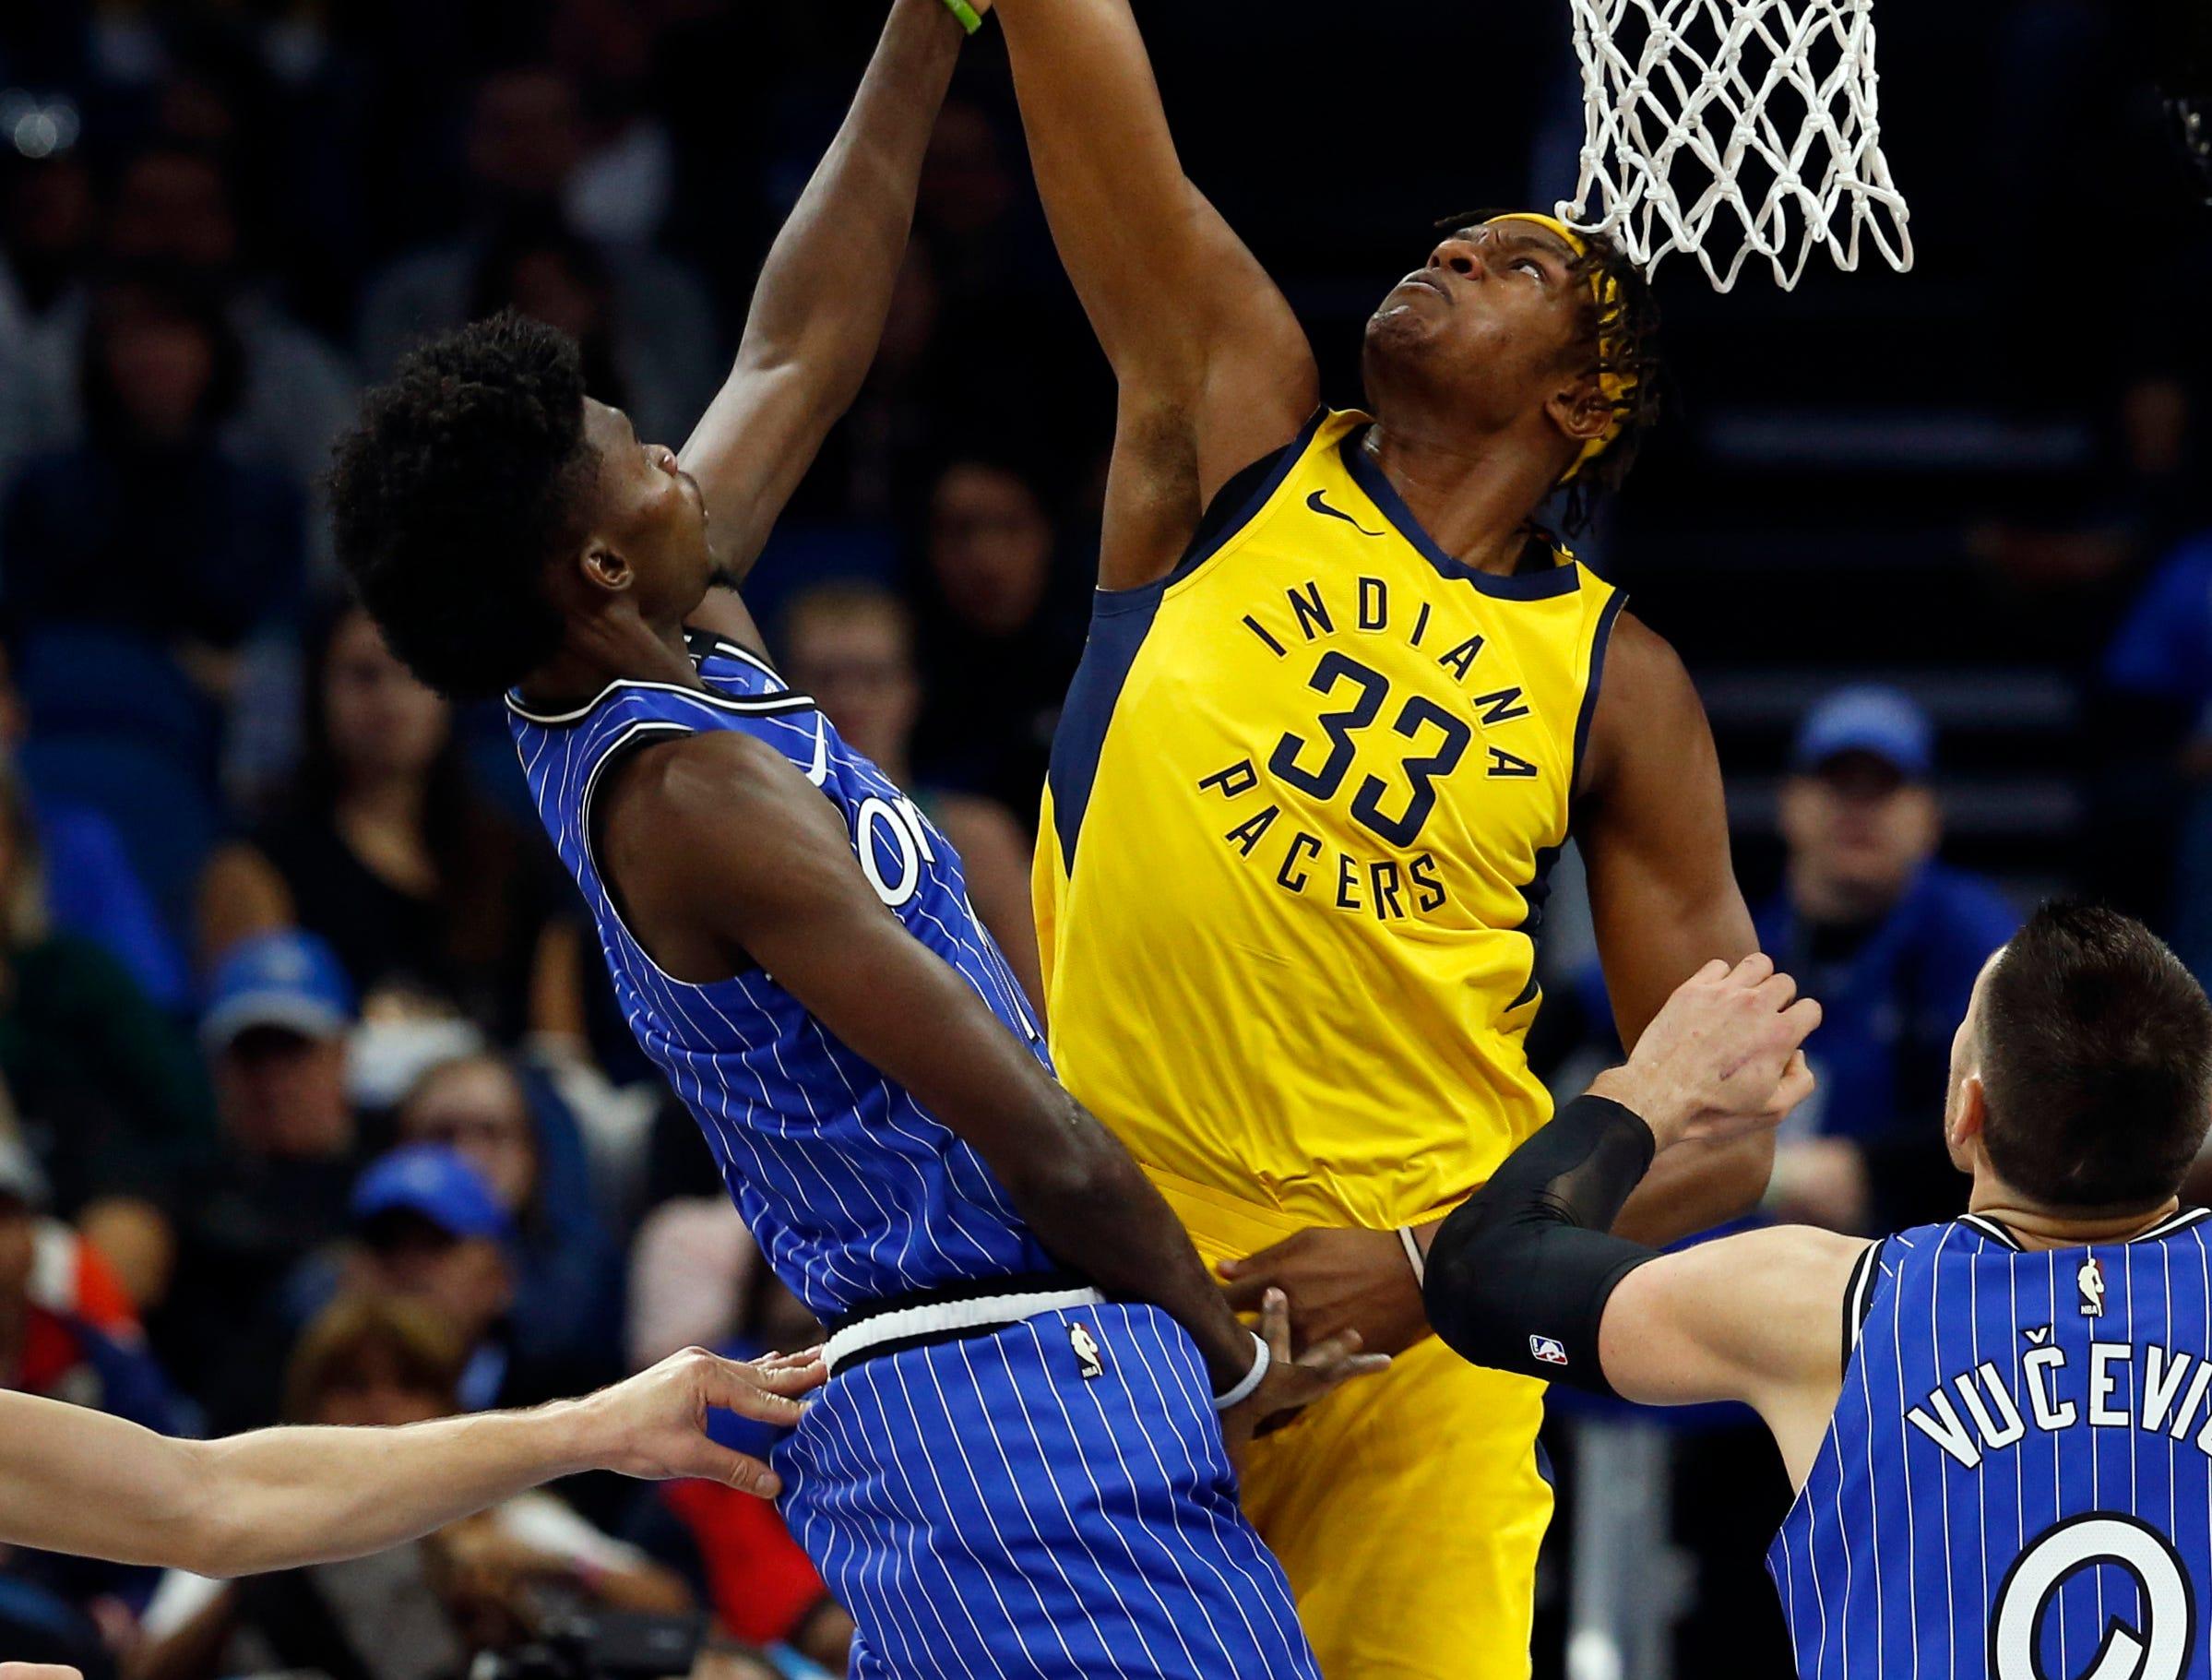 Dec 7, 2018; Orlando, FL, USA; Indiana Pacers center Myles Turner (33) blocks Orlando Magic forward Jonathan Isaac (1) shot during the first quarter at Amway Center. Mandatory Credit: Kim Klement-USA TODAY Sports